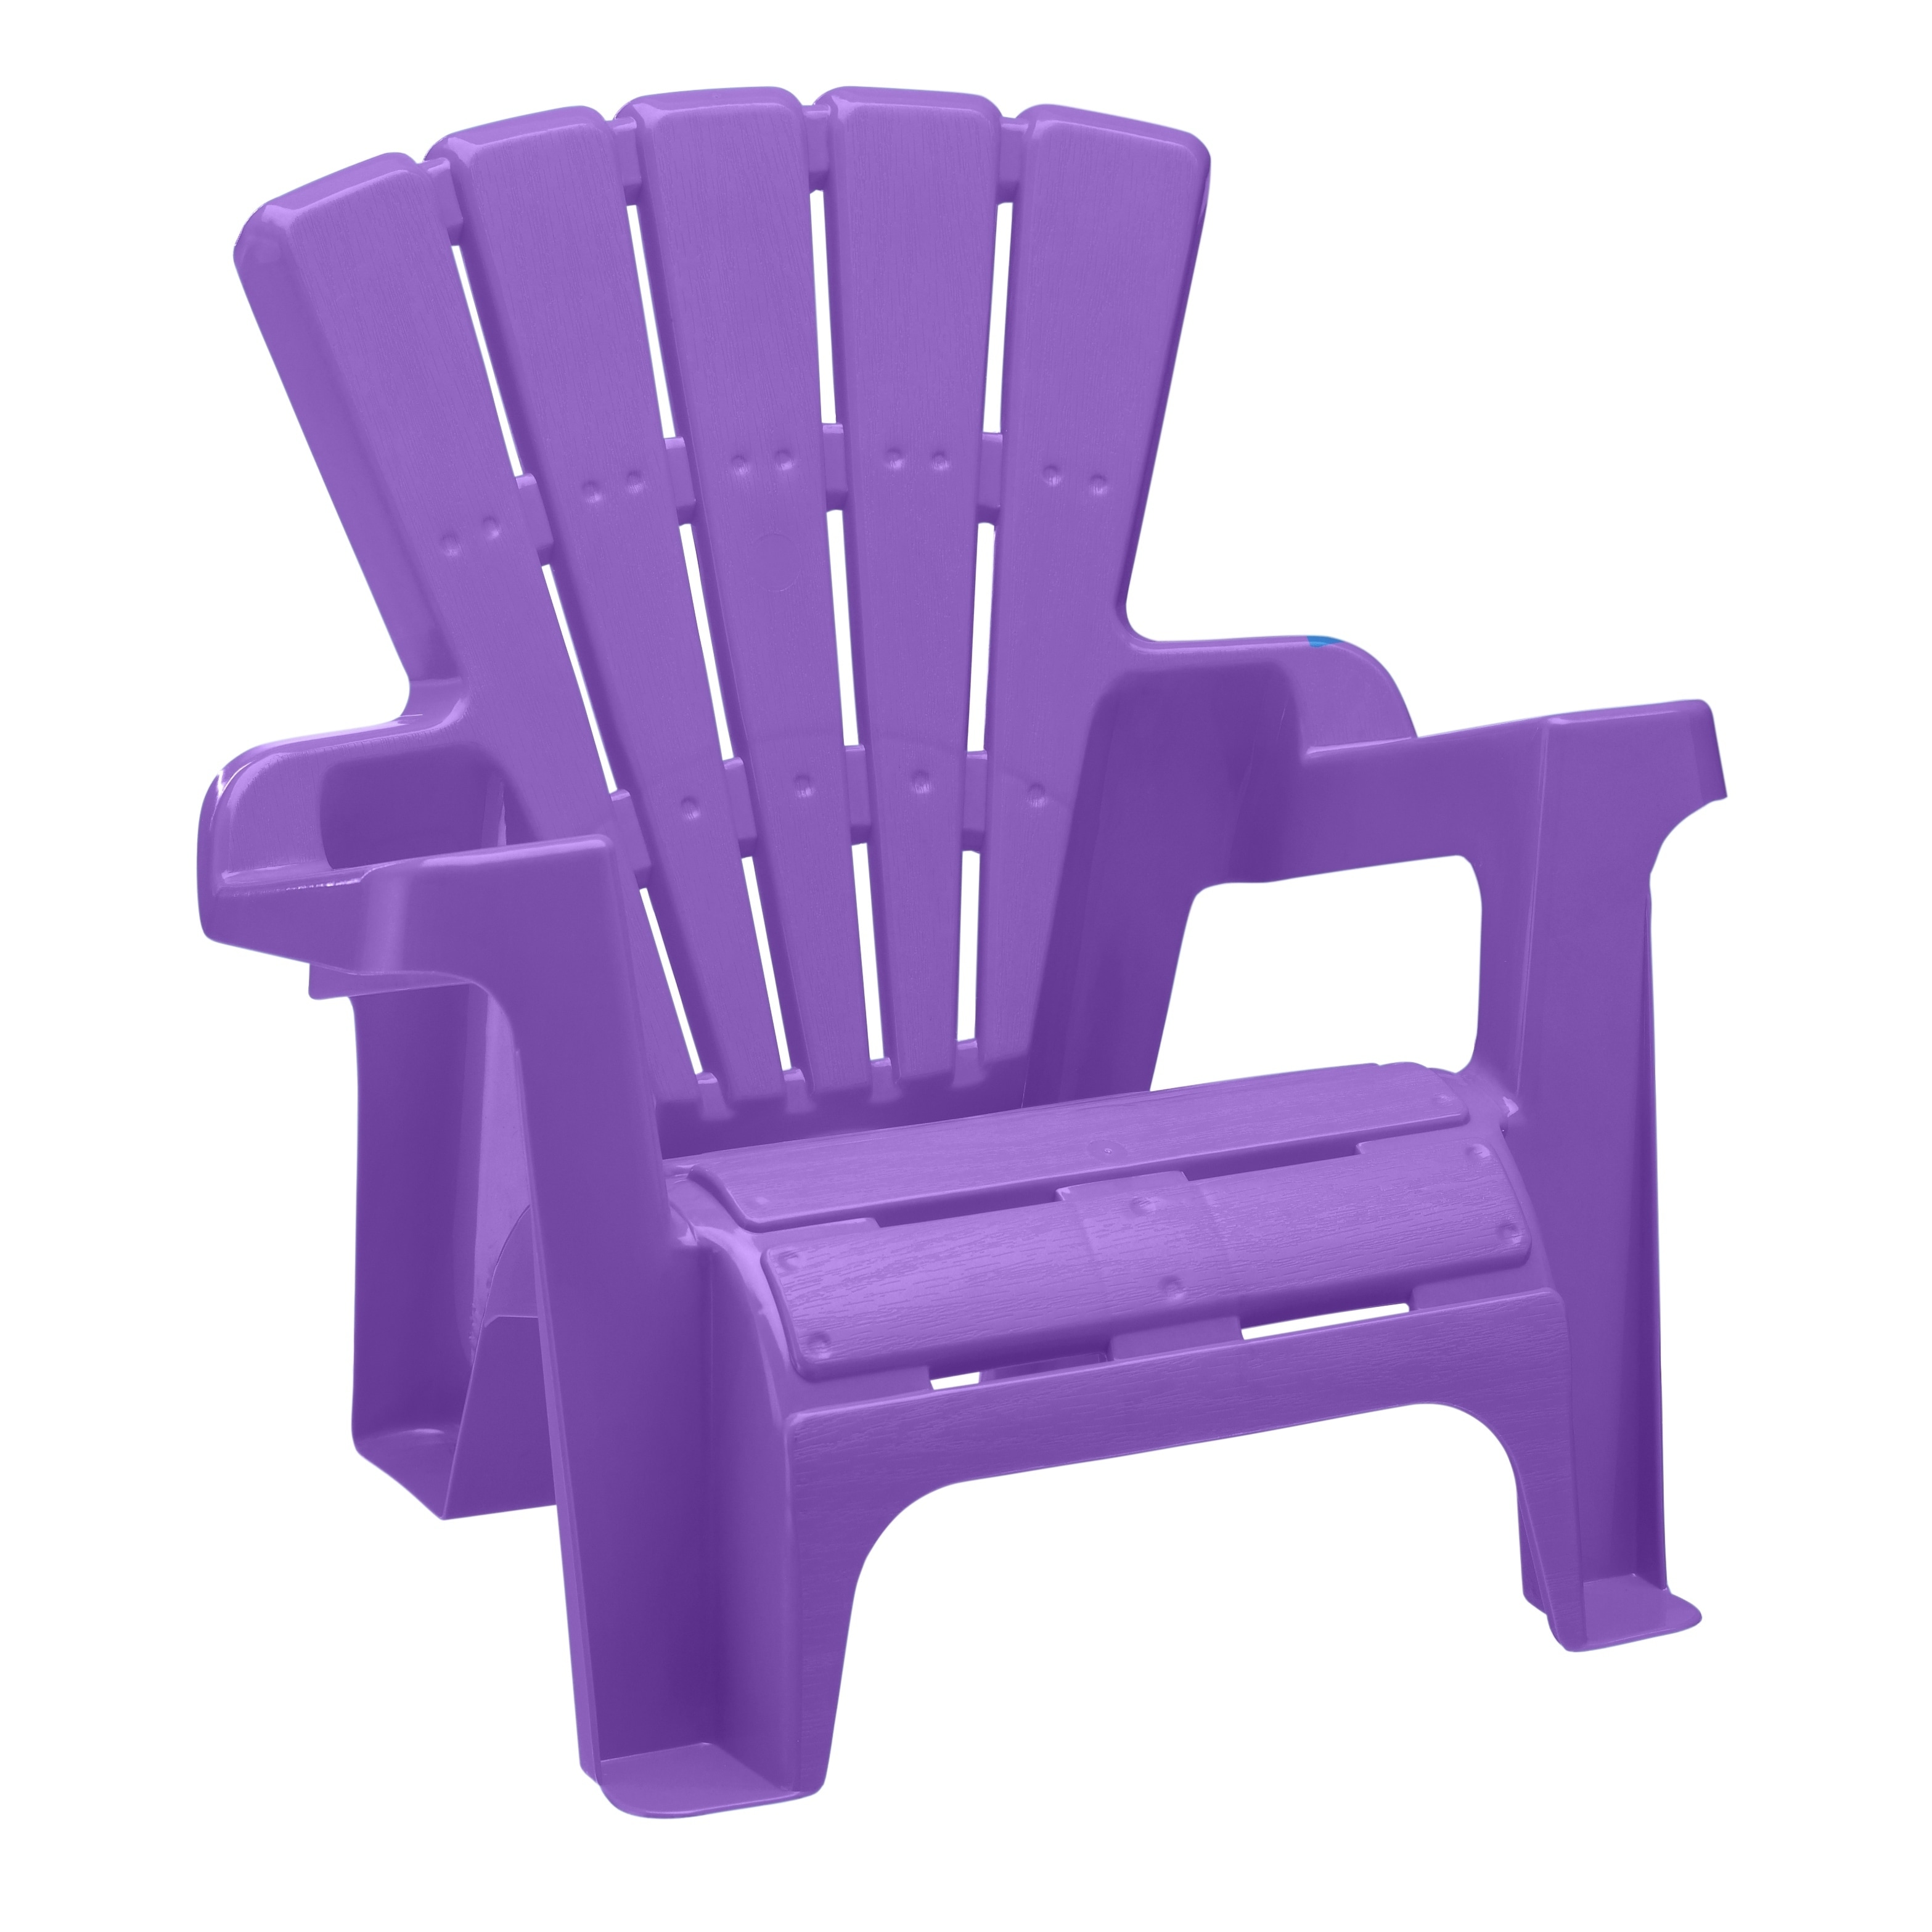 Adirondack Chair Assortment 6 Pack Blue